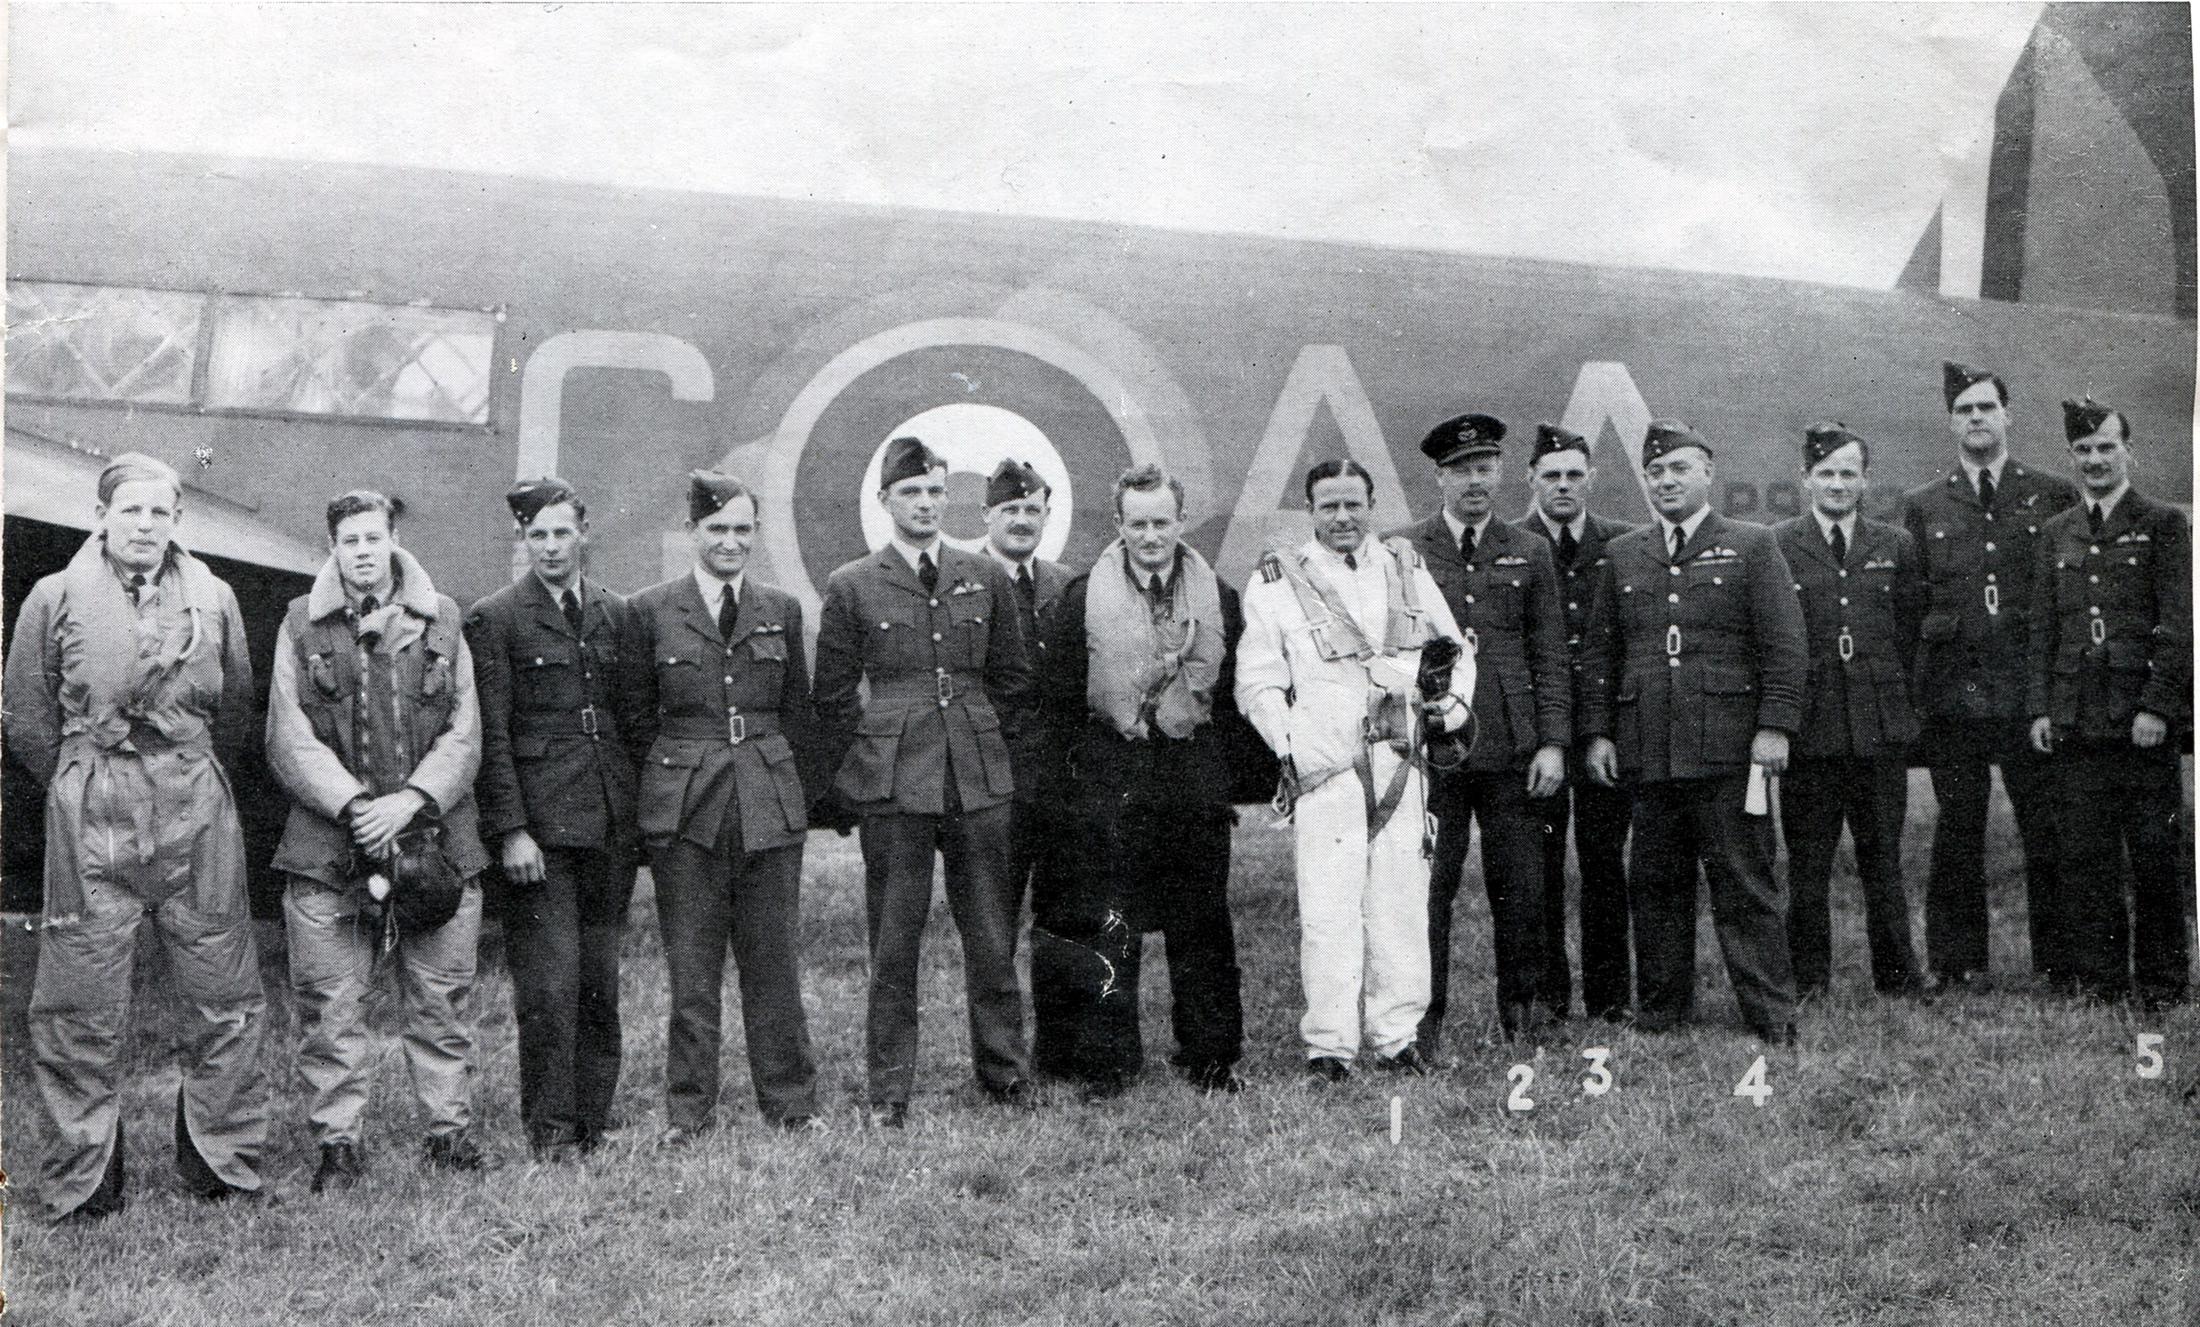 EarlyOpsASquadronGroup1940